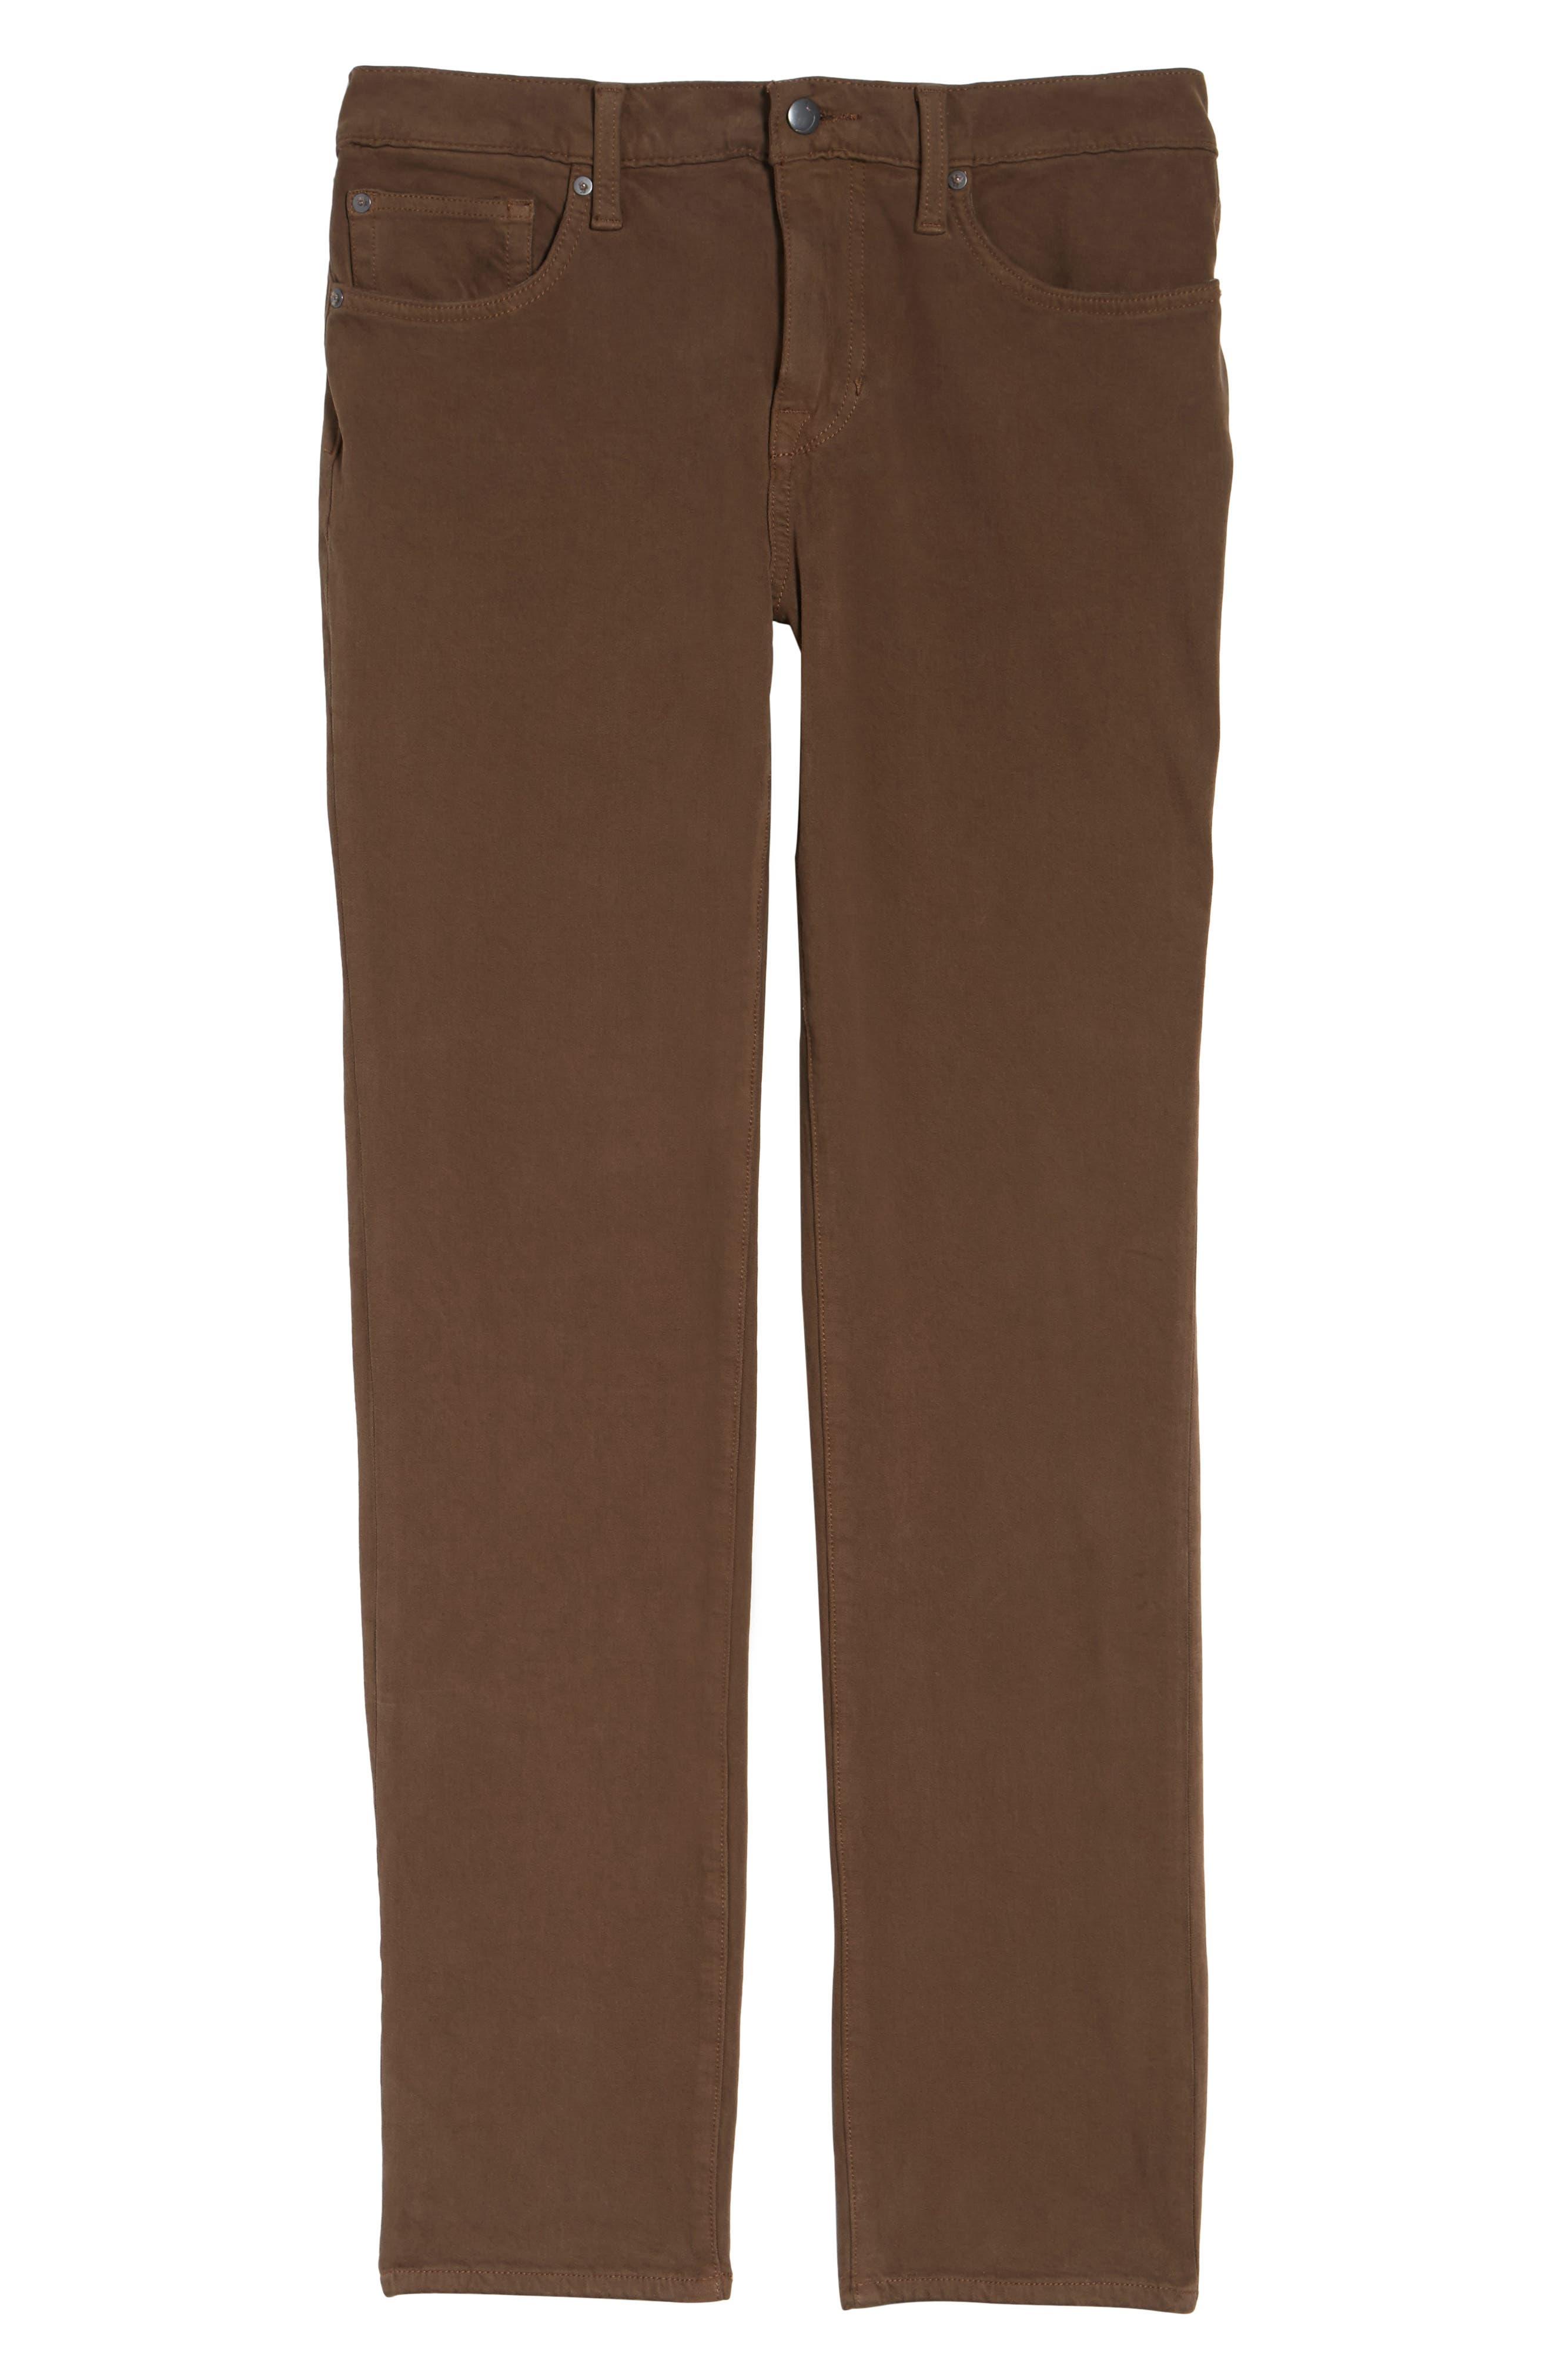 Brixton Slim Straight Fit Jeans,                             Alternate thumbnail 6, color,                             202